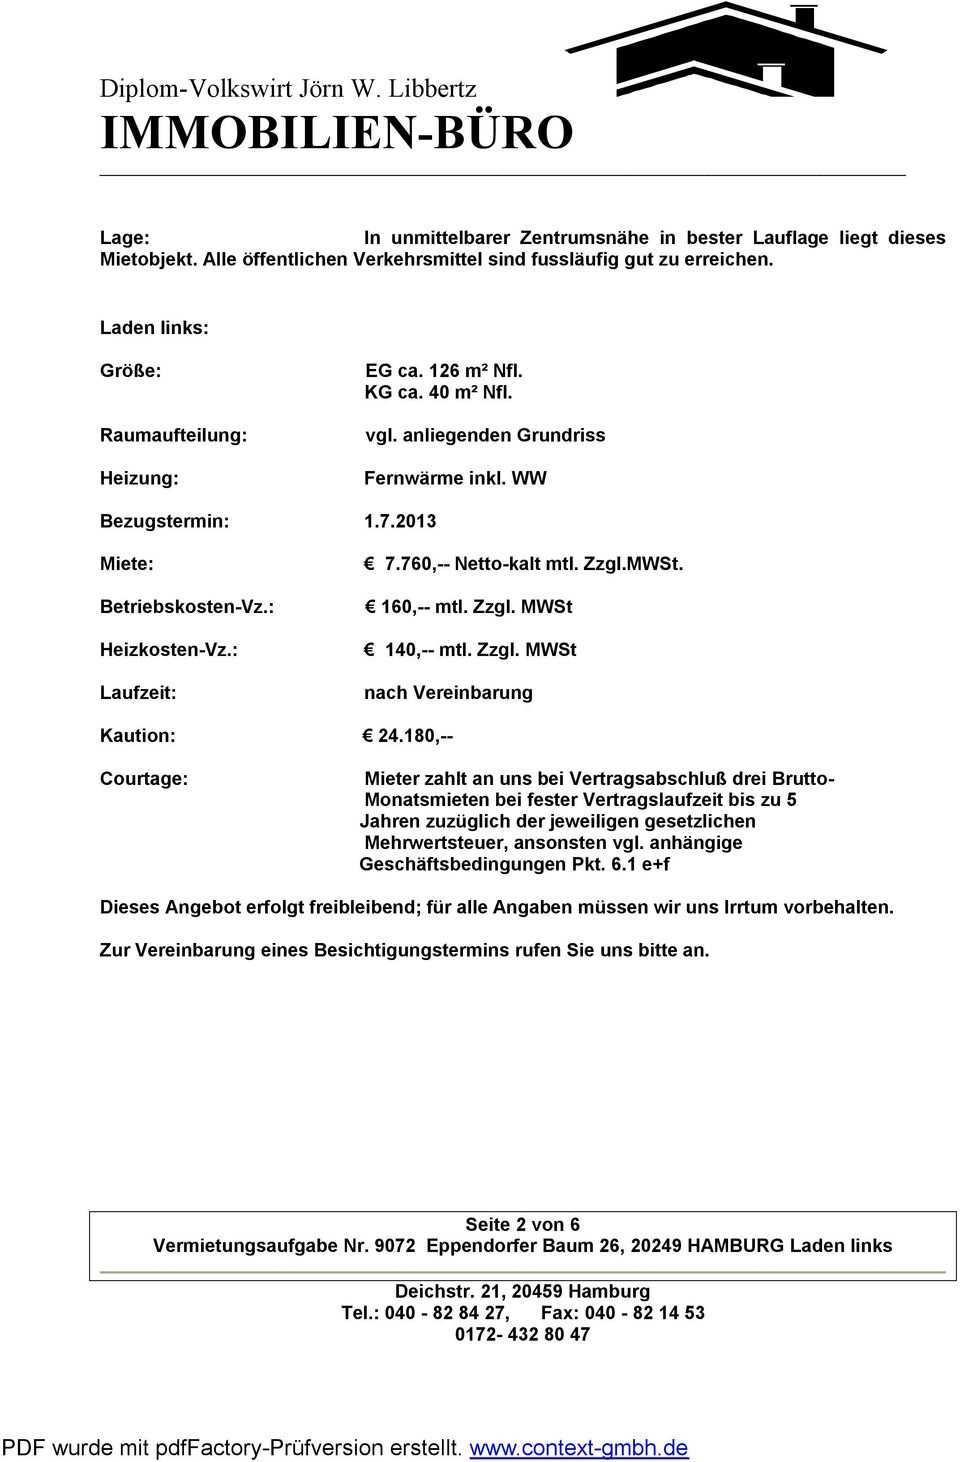 Diplom Volkswirt Jorn W Libbertz Immobilien Buro Pdf Kostenfreier Download